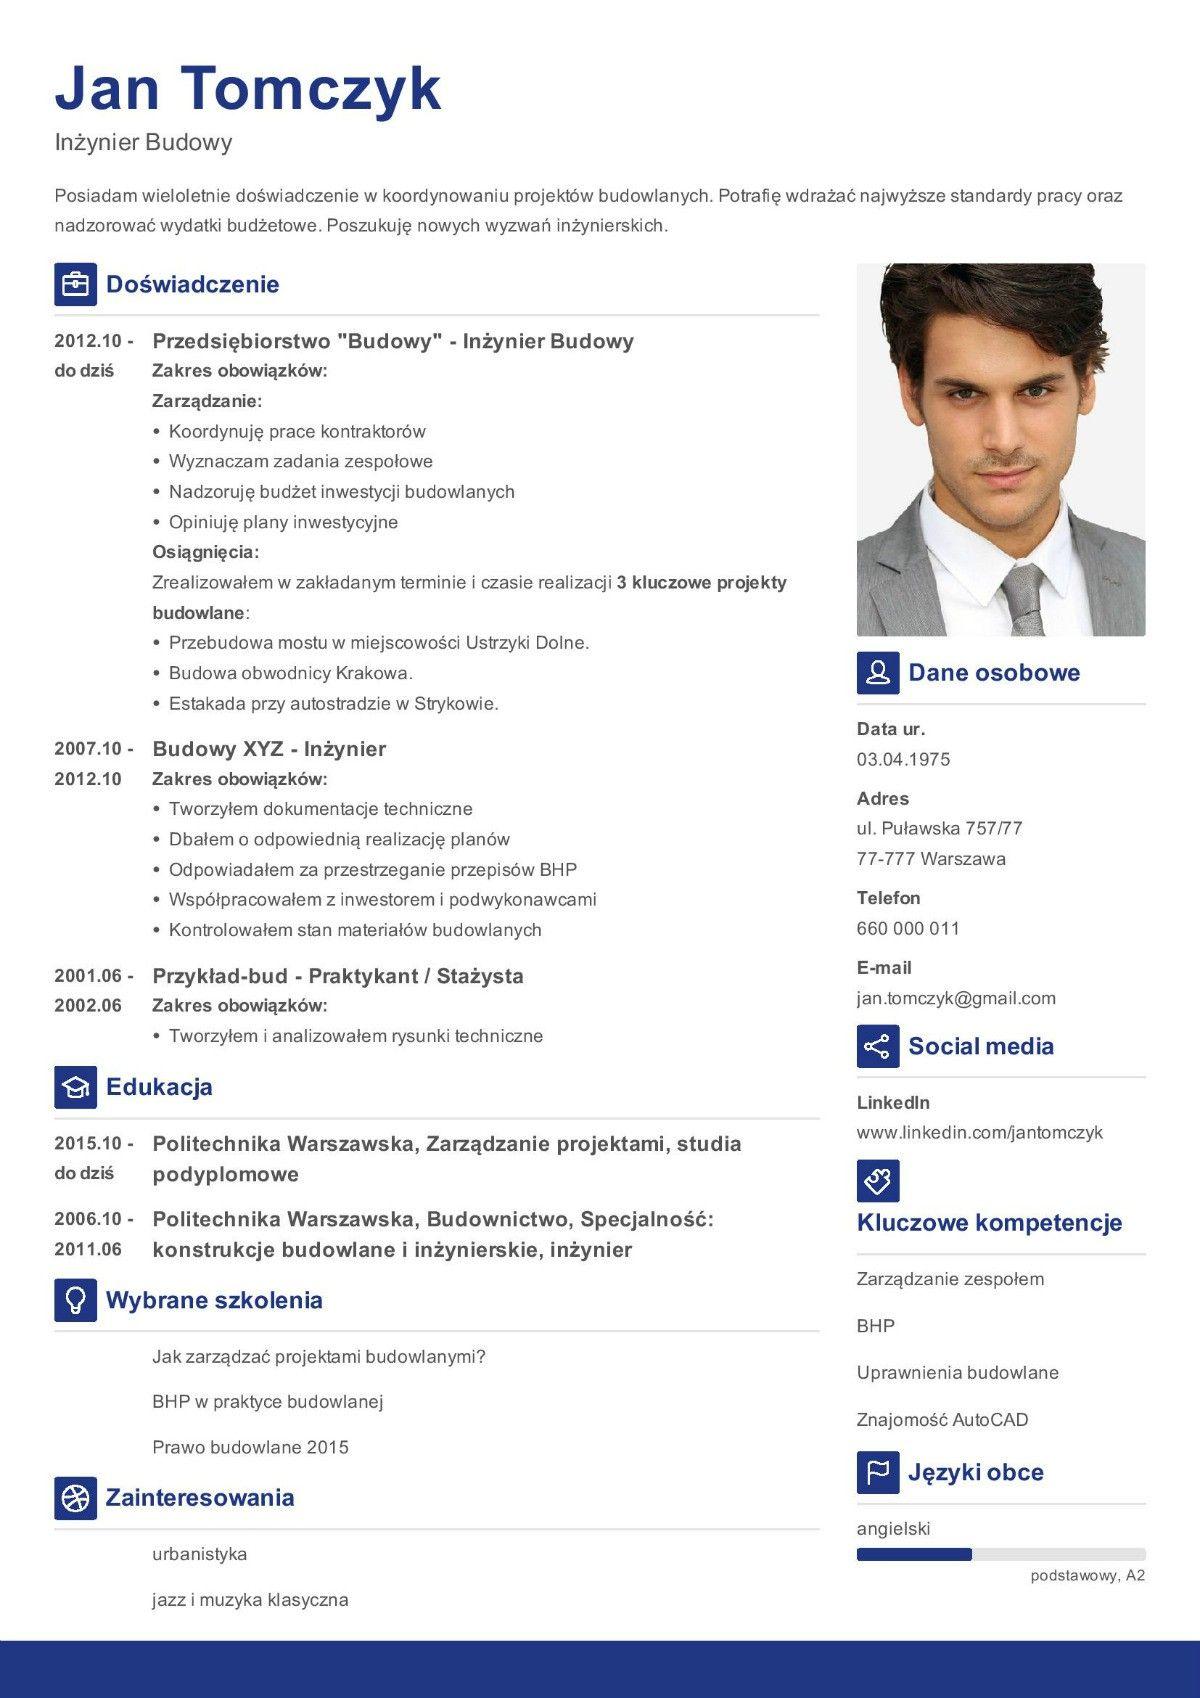 Znalezione Obrazy Dla Zapytania Jak Napisac Cv Curriculum Vitae Curriculum List